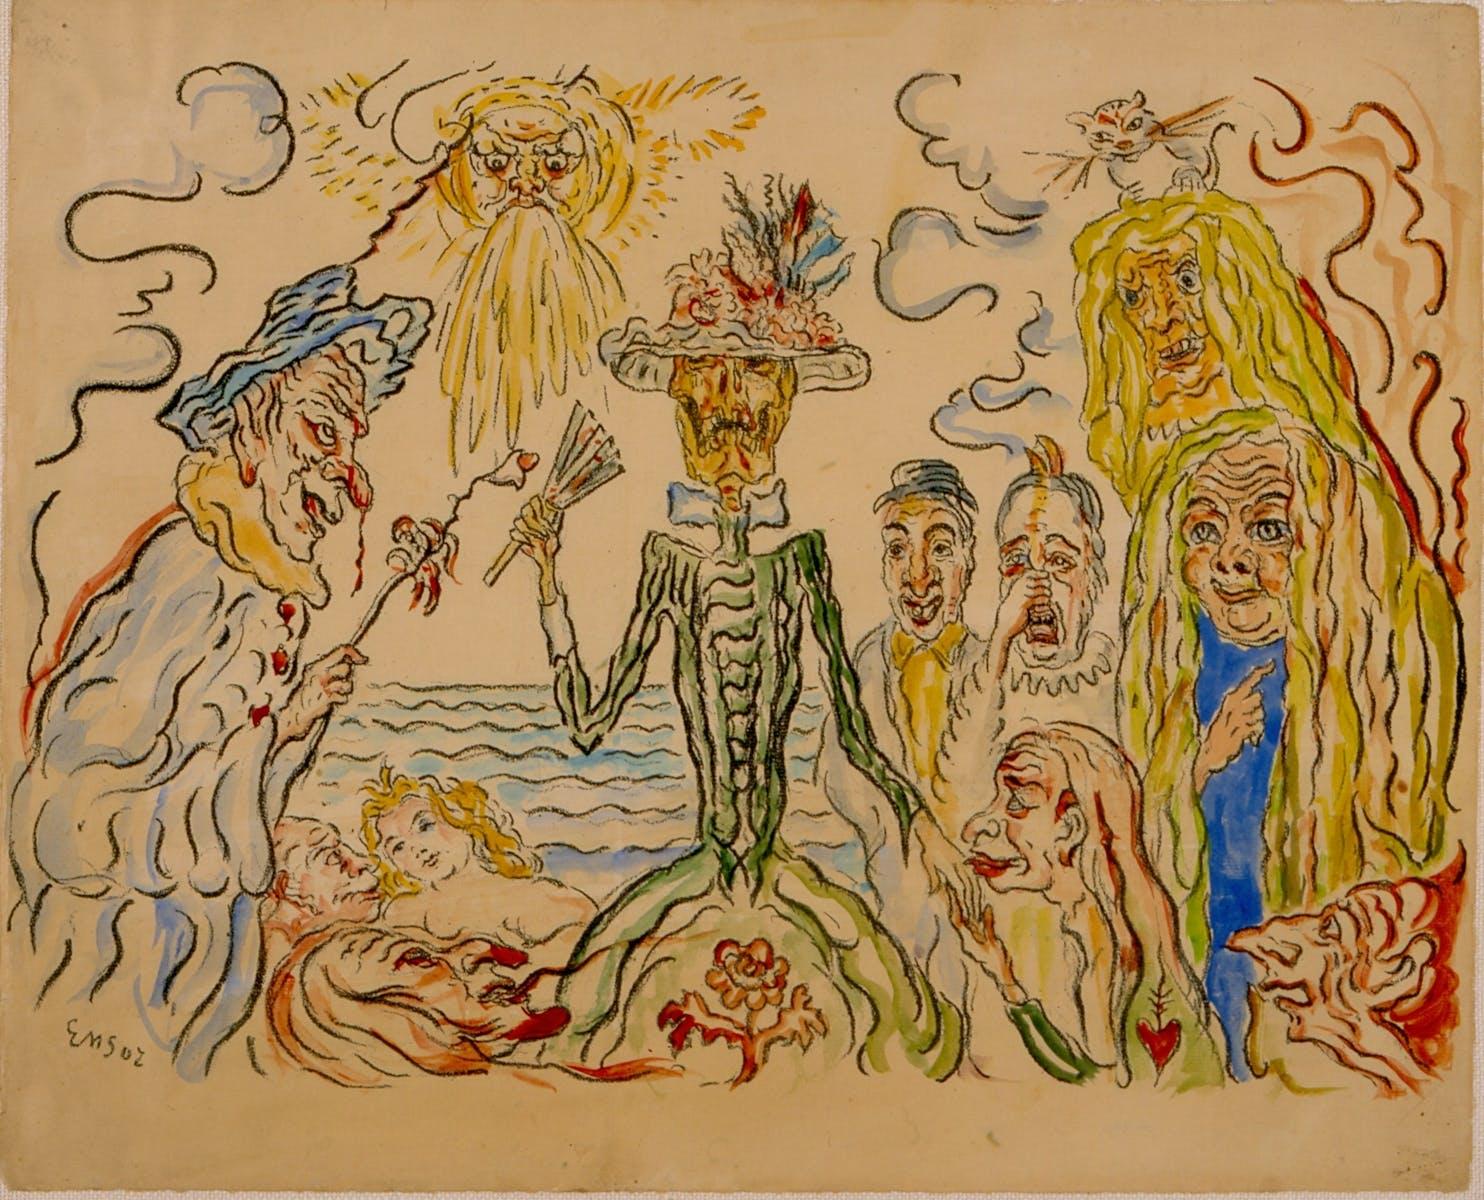 James Ensor, De kokette dood